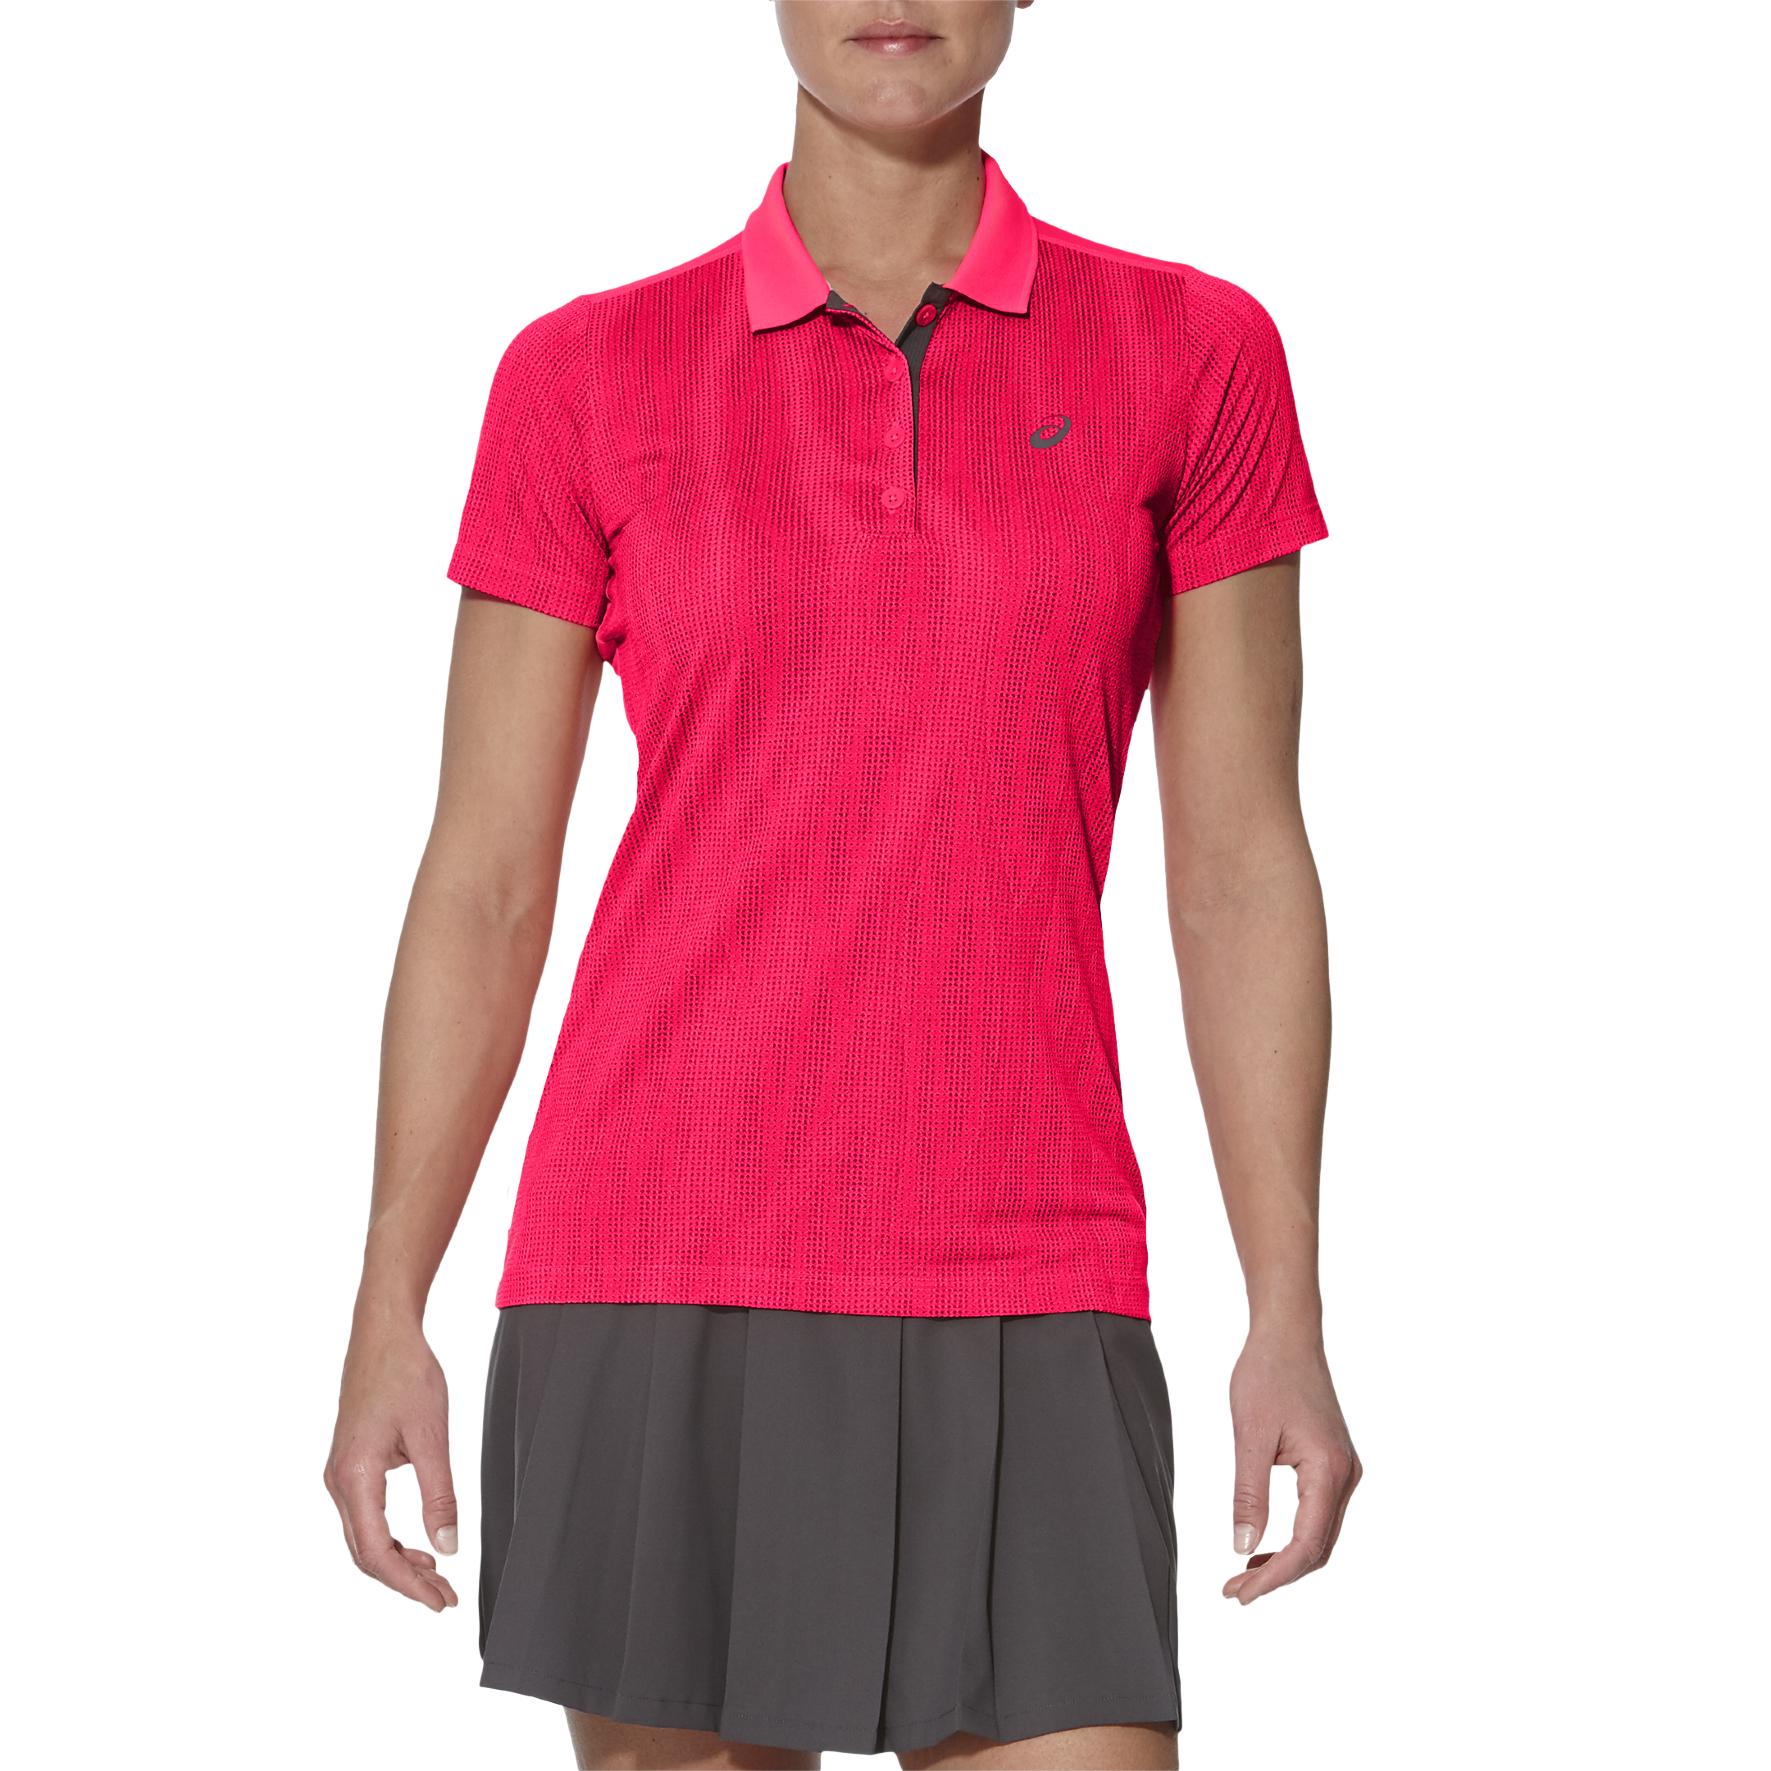 Asics GPX SS Ladies Tennis Polo - Pink, S